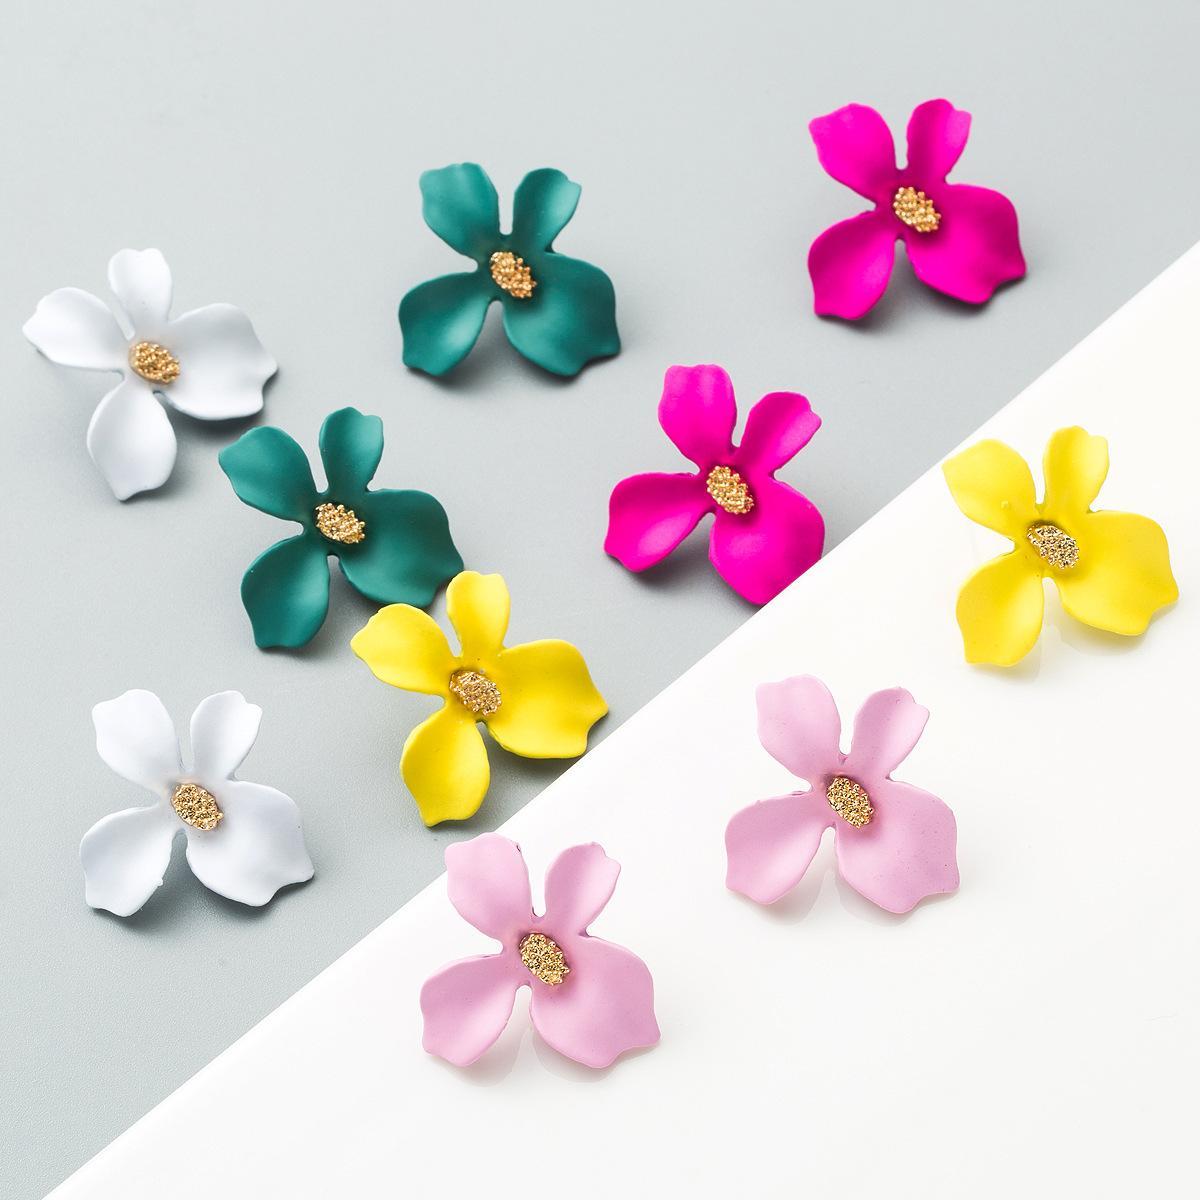 Personalized Candy Color Flower Stud Earring New Fashion Small Flower Earrings for Women Girls Korea Style Jewelry